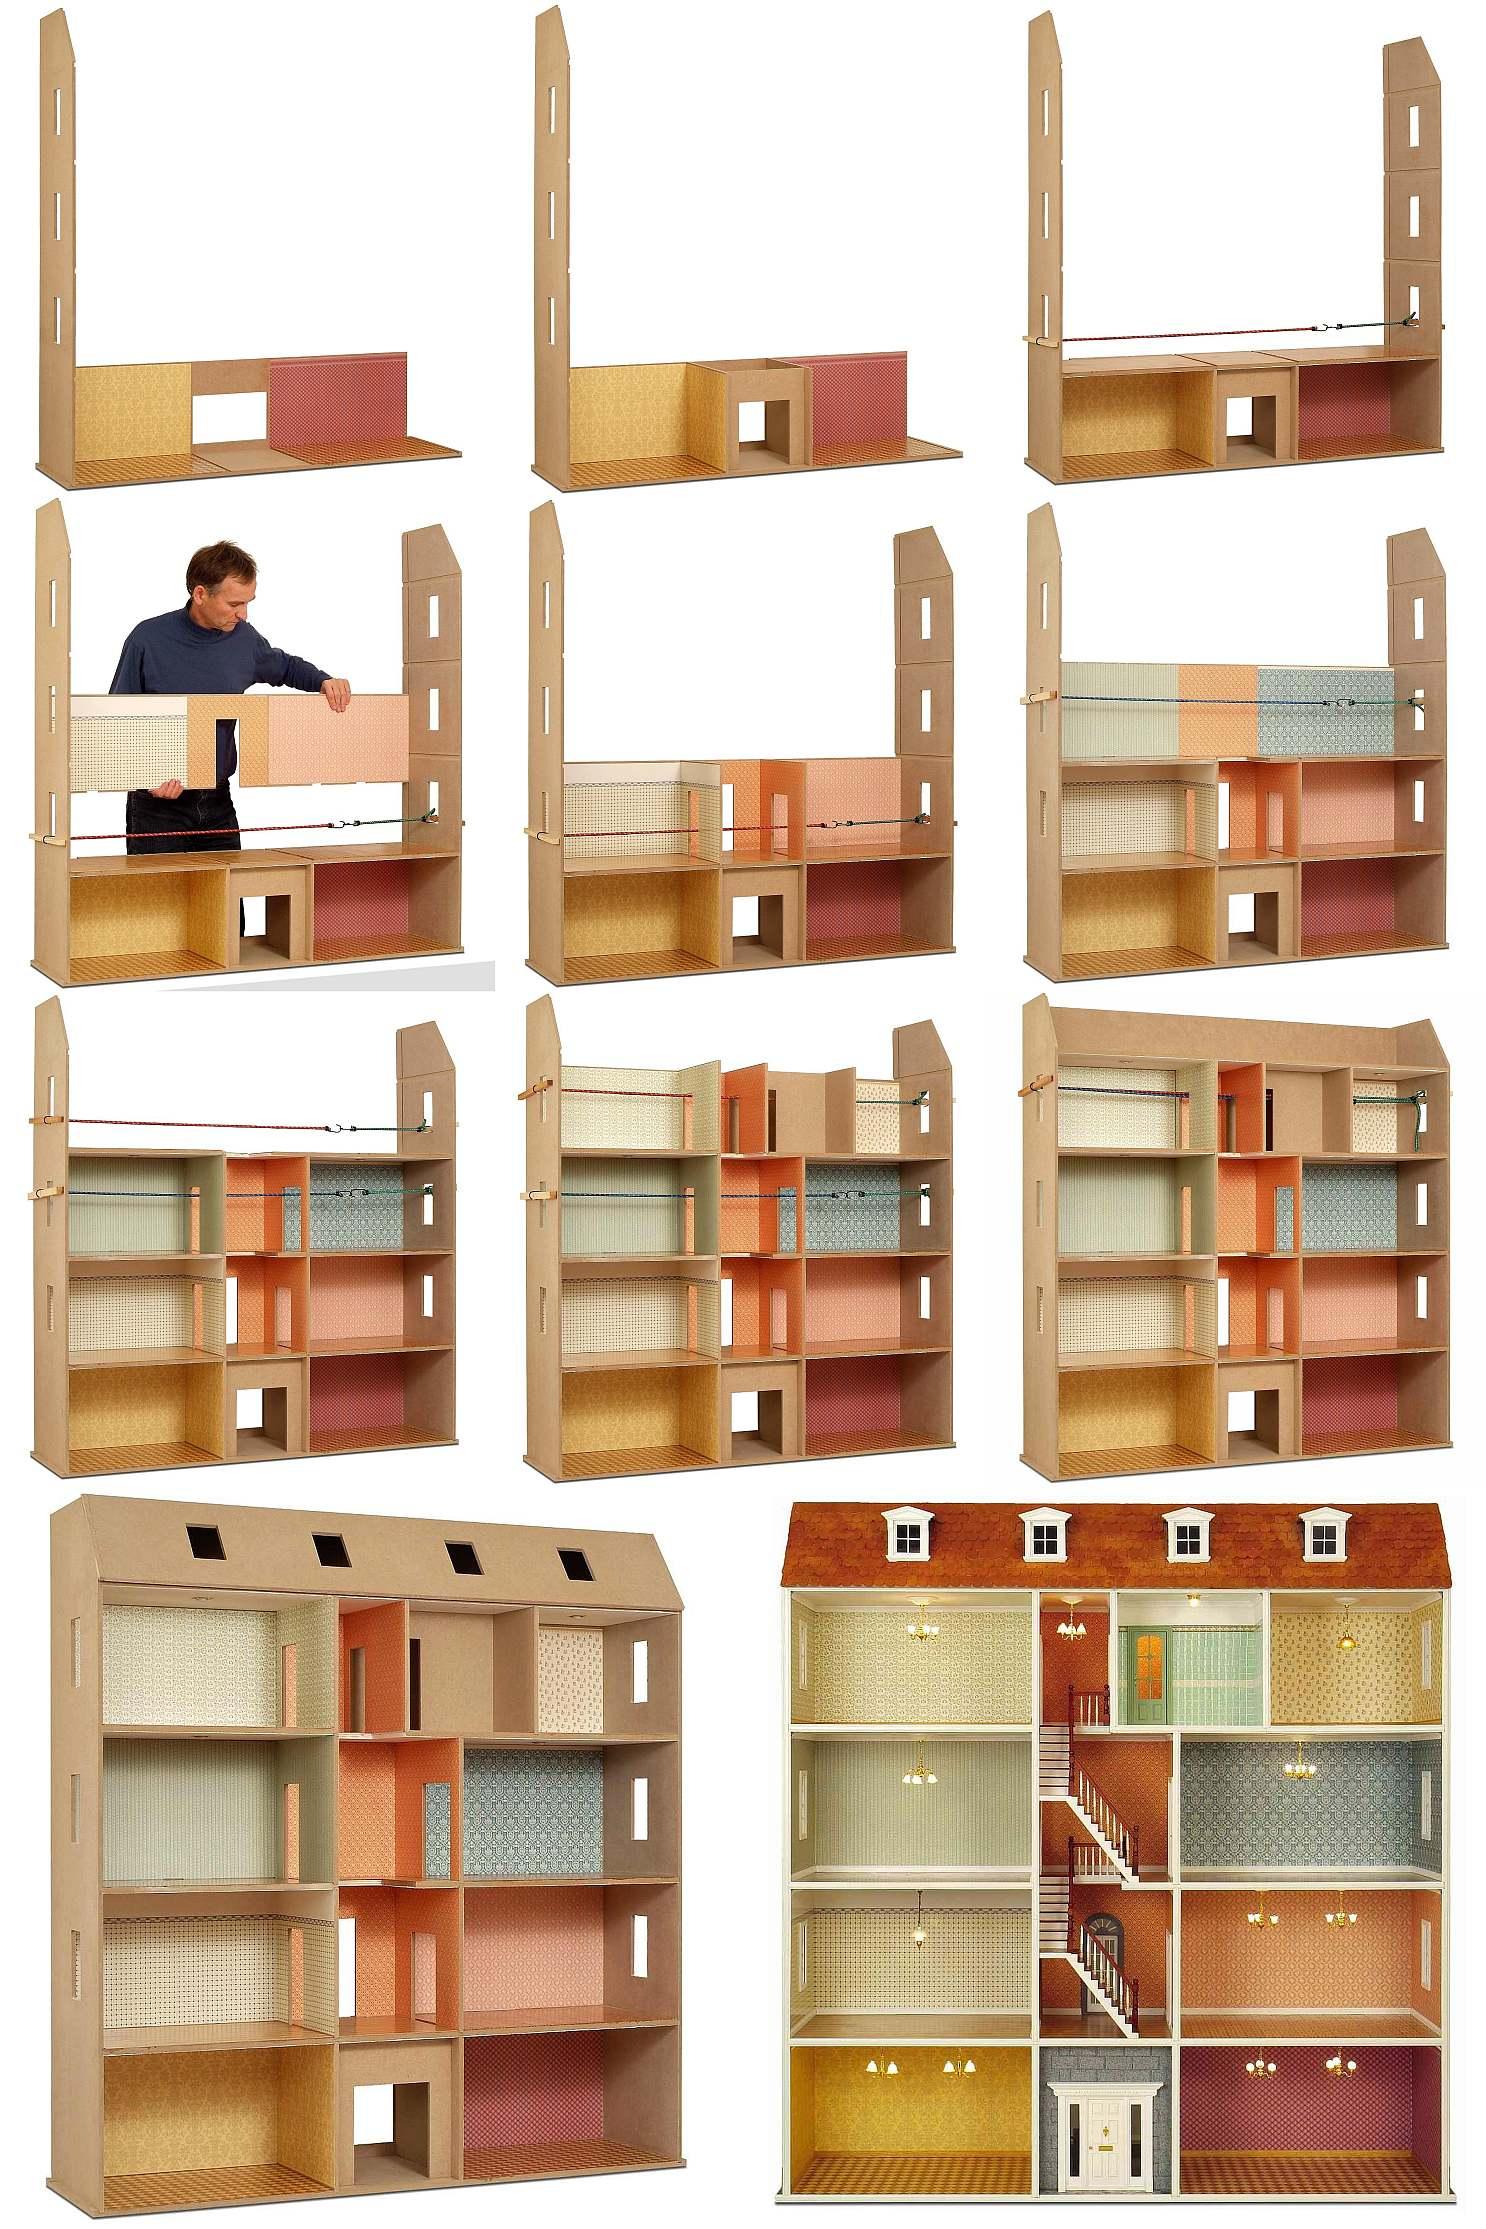 hausbau stadthaus. Black Bedroom Furniture Sets. Home Design Ideas